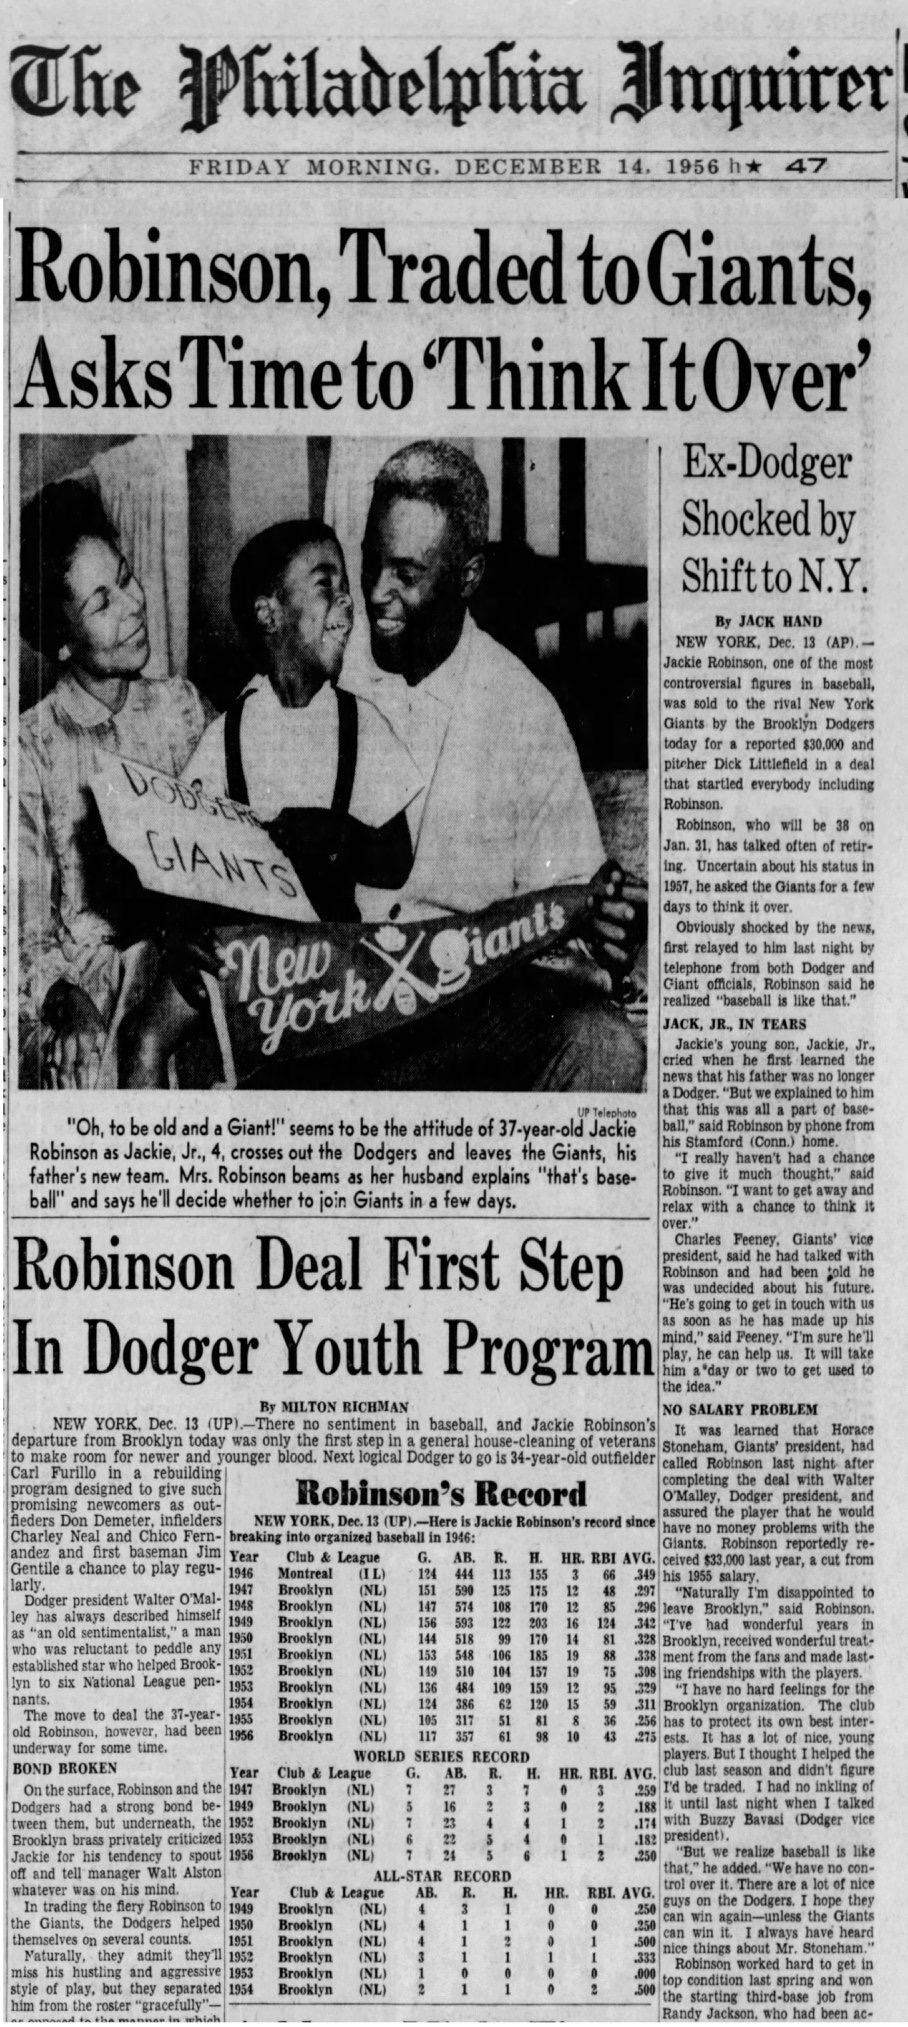 Jackie Robinson Philadelphia inquirer